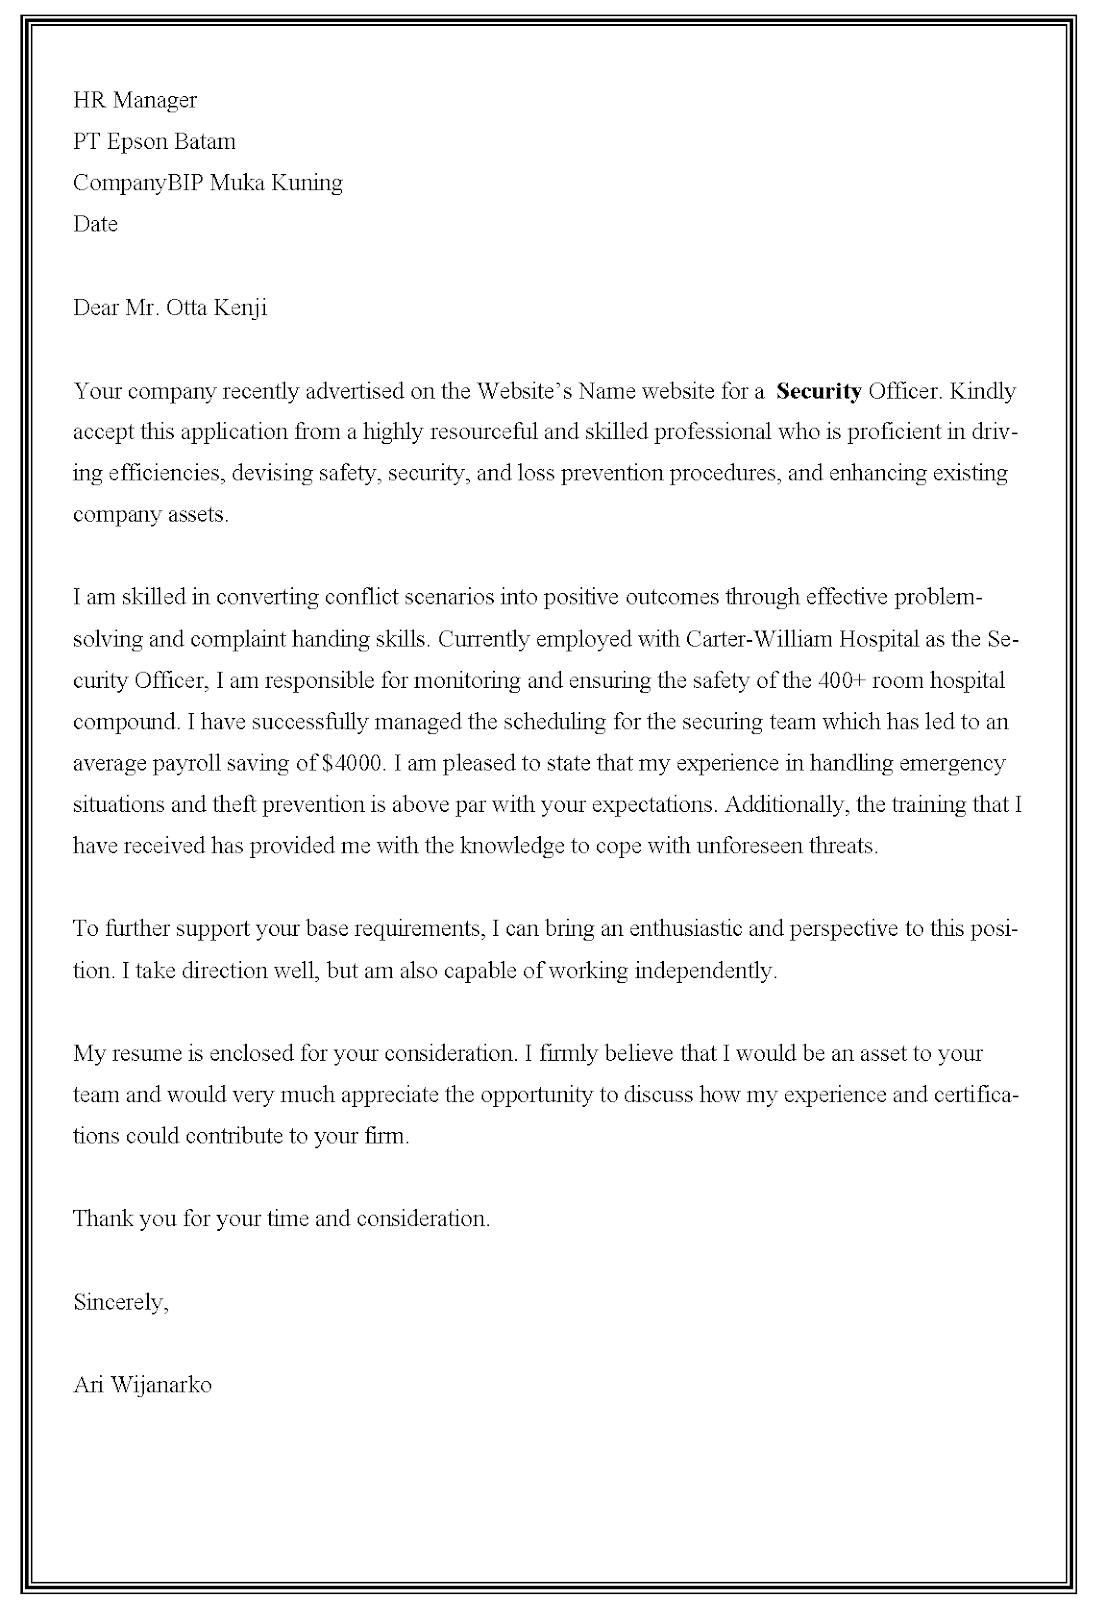 Contoh surat lamaran kerja Security dalam bahasa Inggris